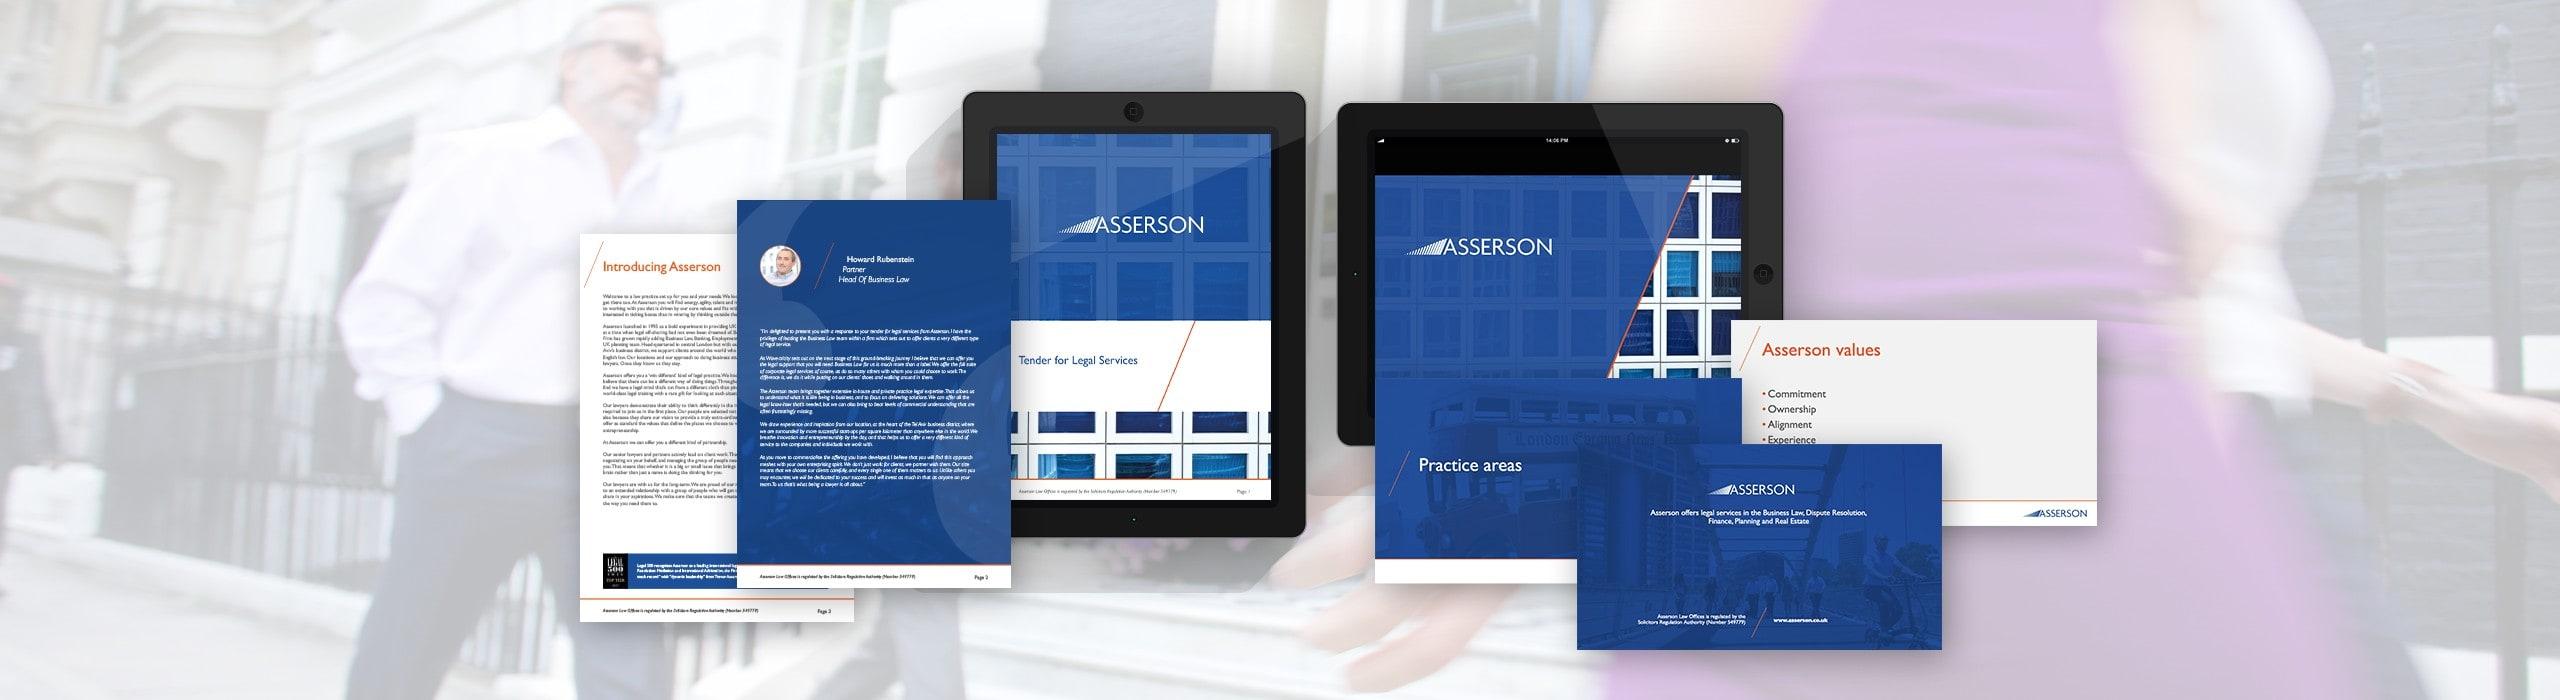 Asserson - natie-asserson-web - Natie Branding Agency